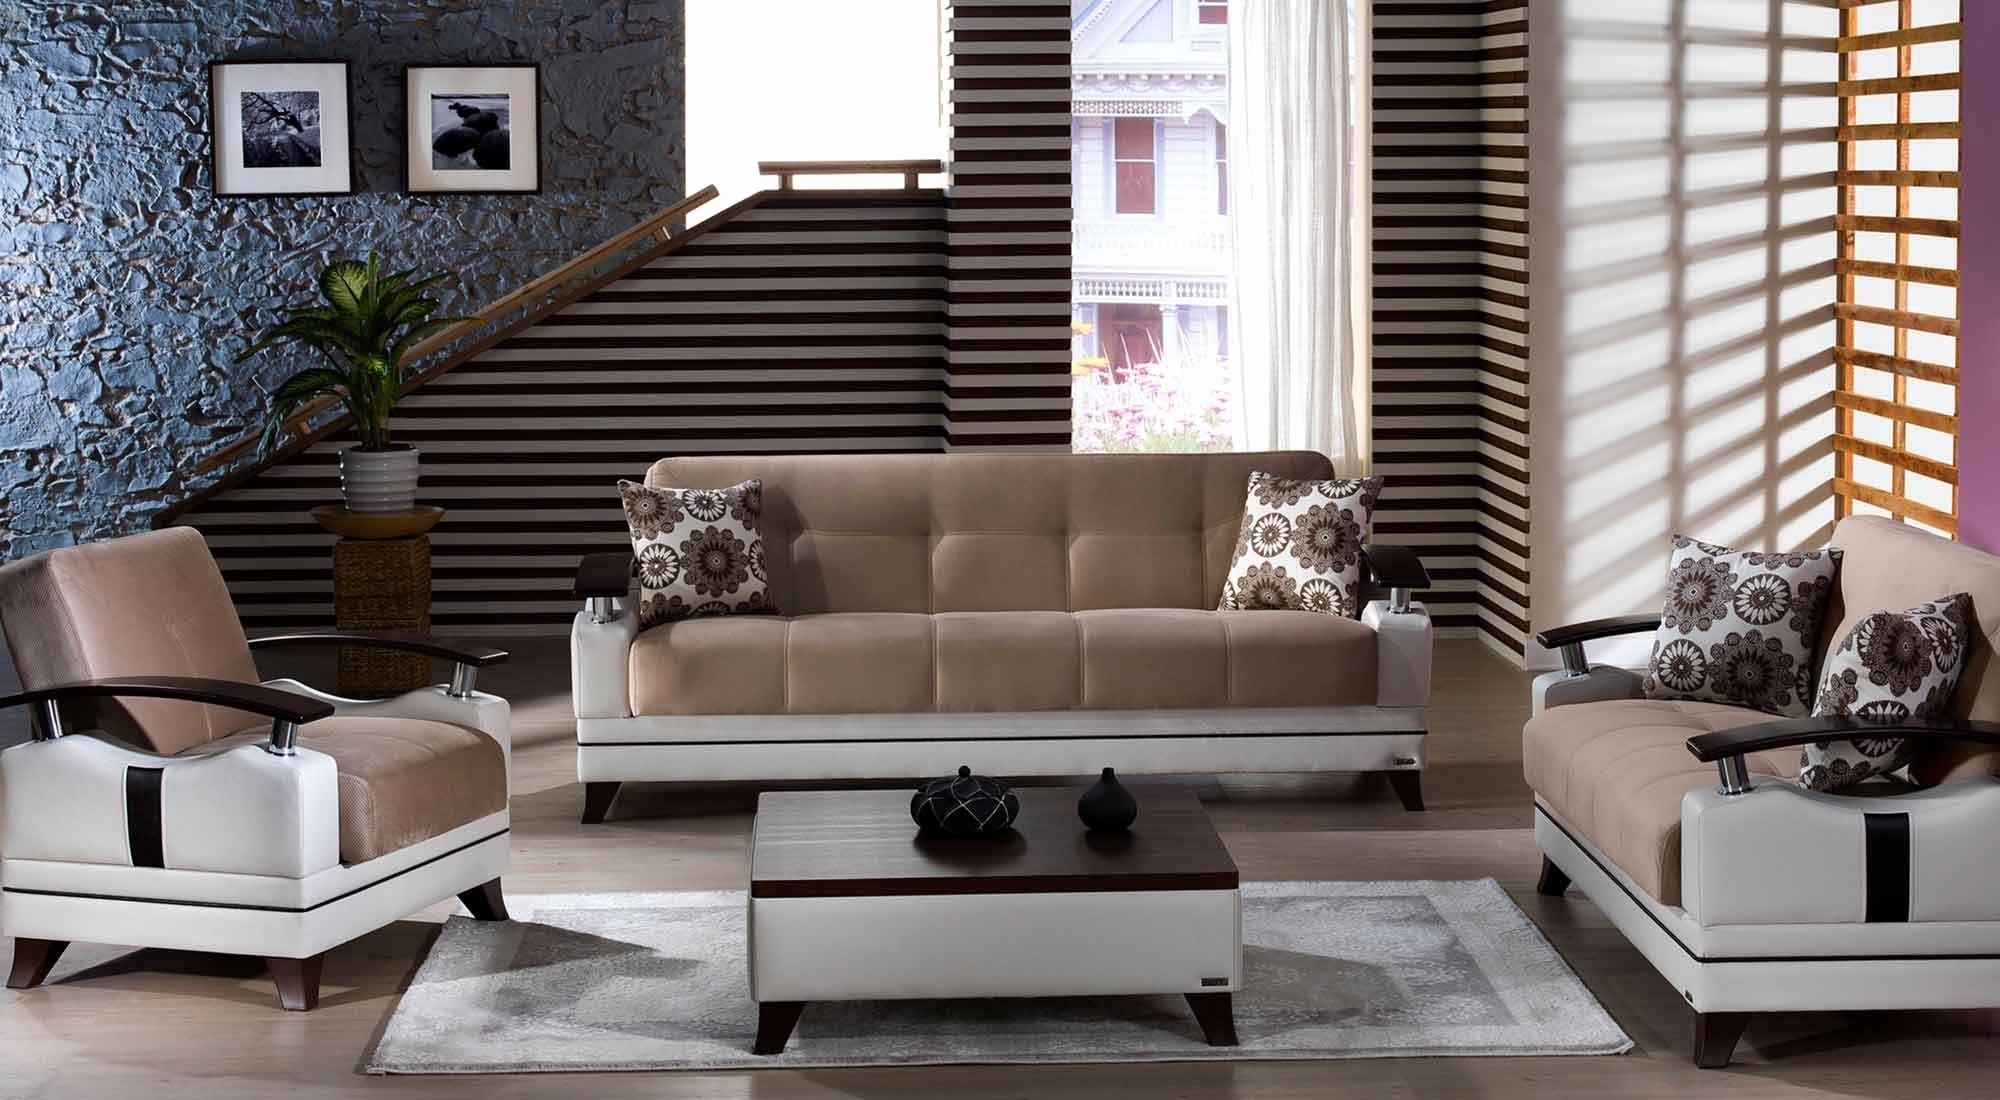 Inspirational Living Room Set With Sleeper Sofa Art Sleeper Sofa Sets Sofas Living Room Sets Sofa Living Room Sofa